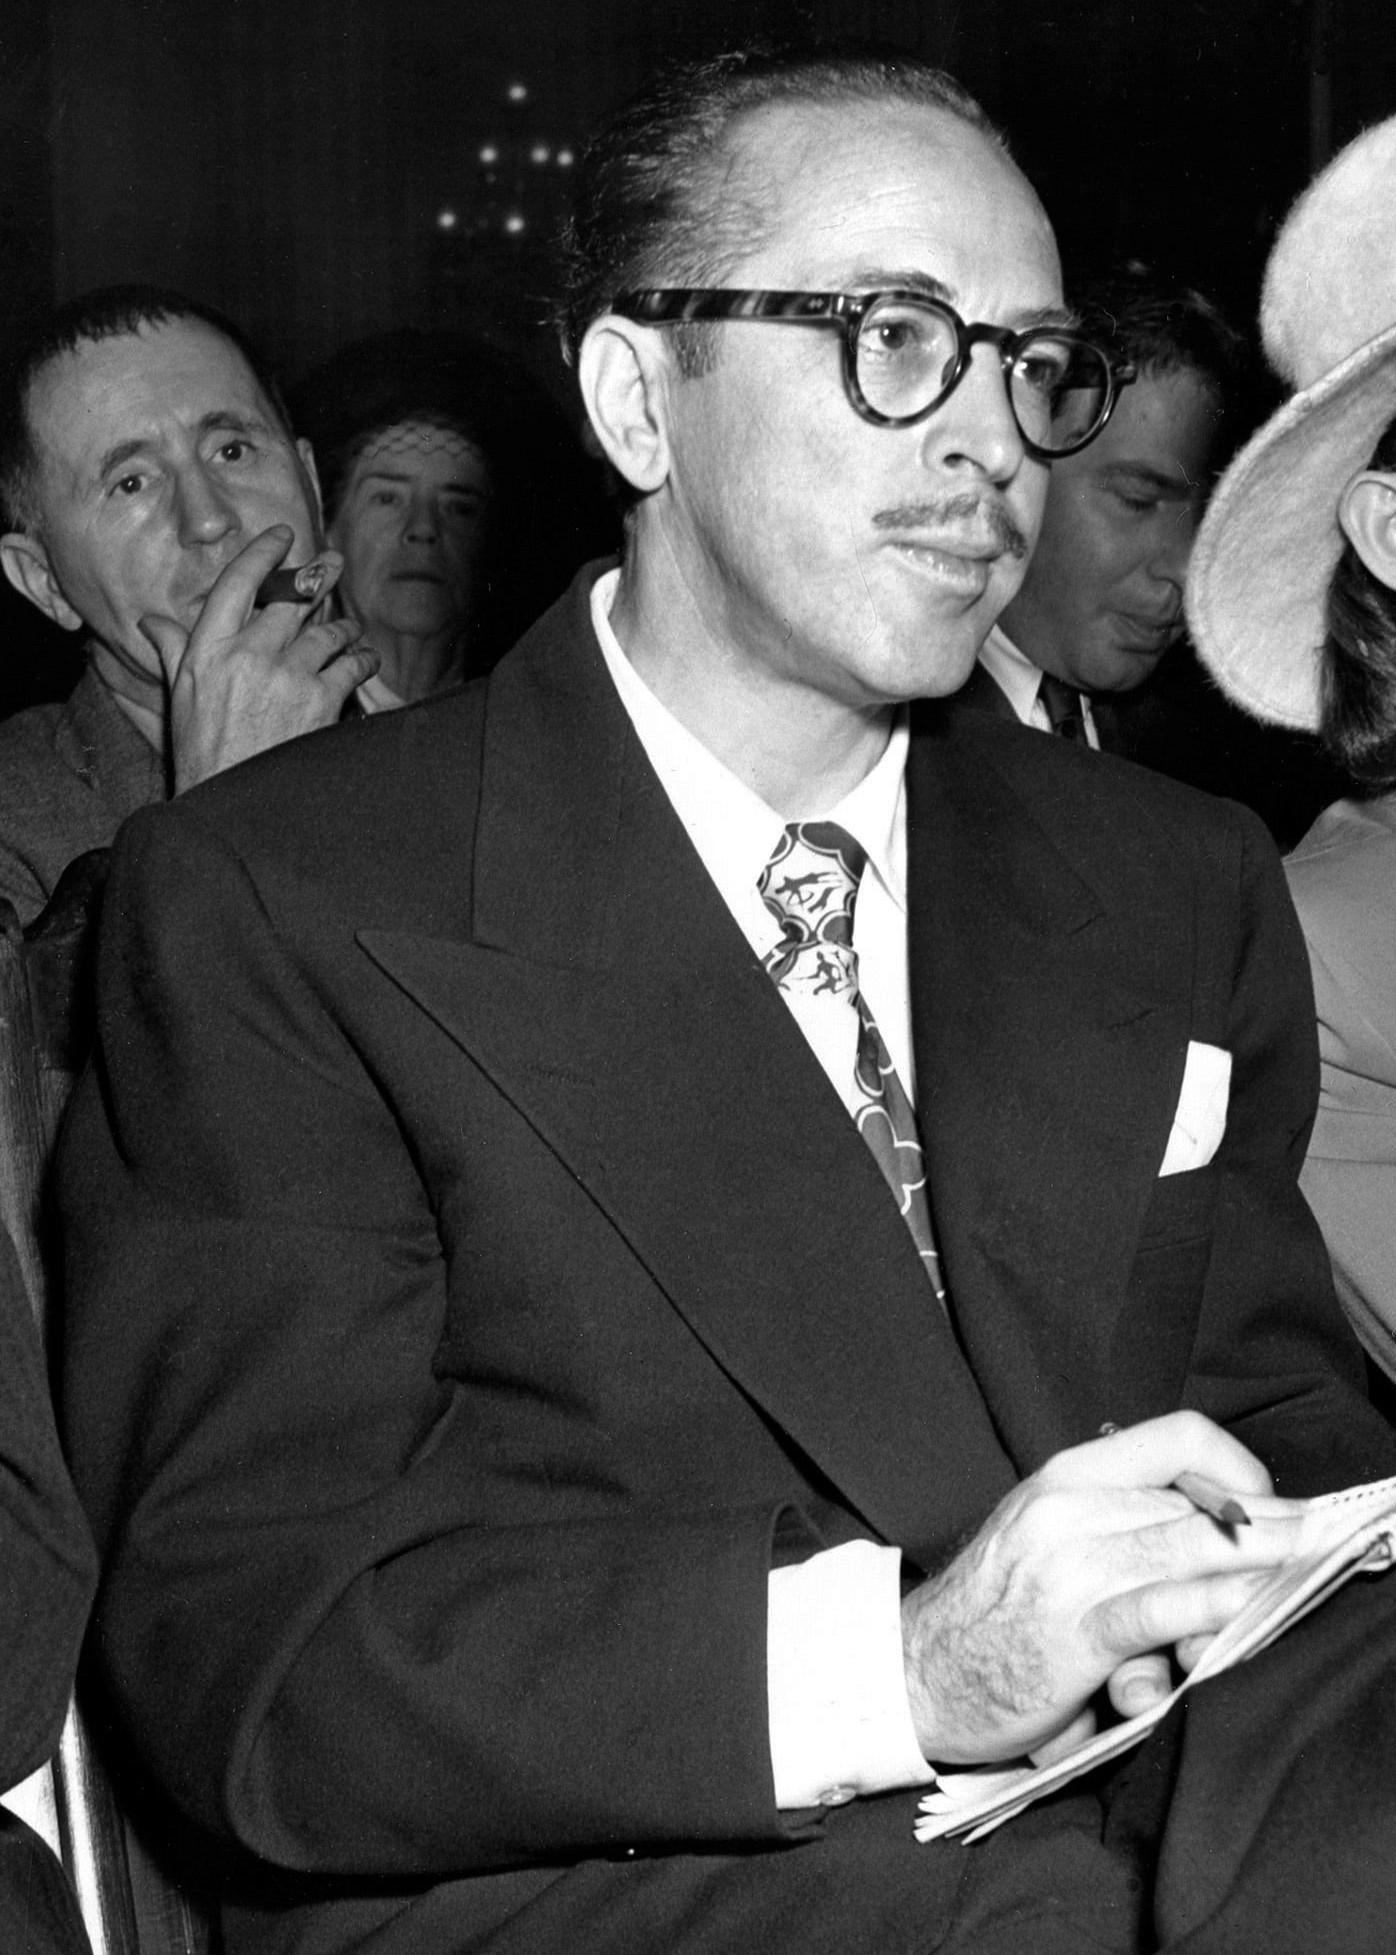 Dalton Trumbo et les « dix d'Hollywood », interdits d'écran parce que communistes